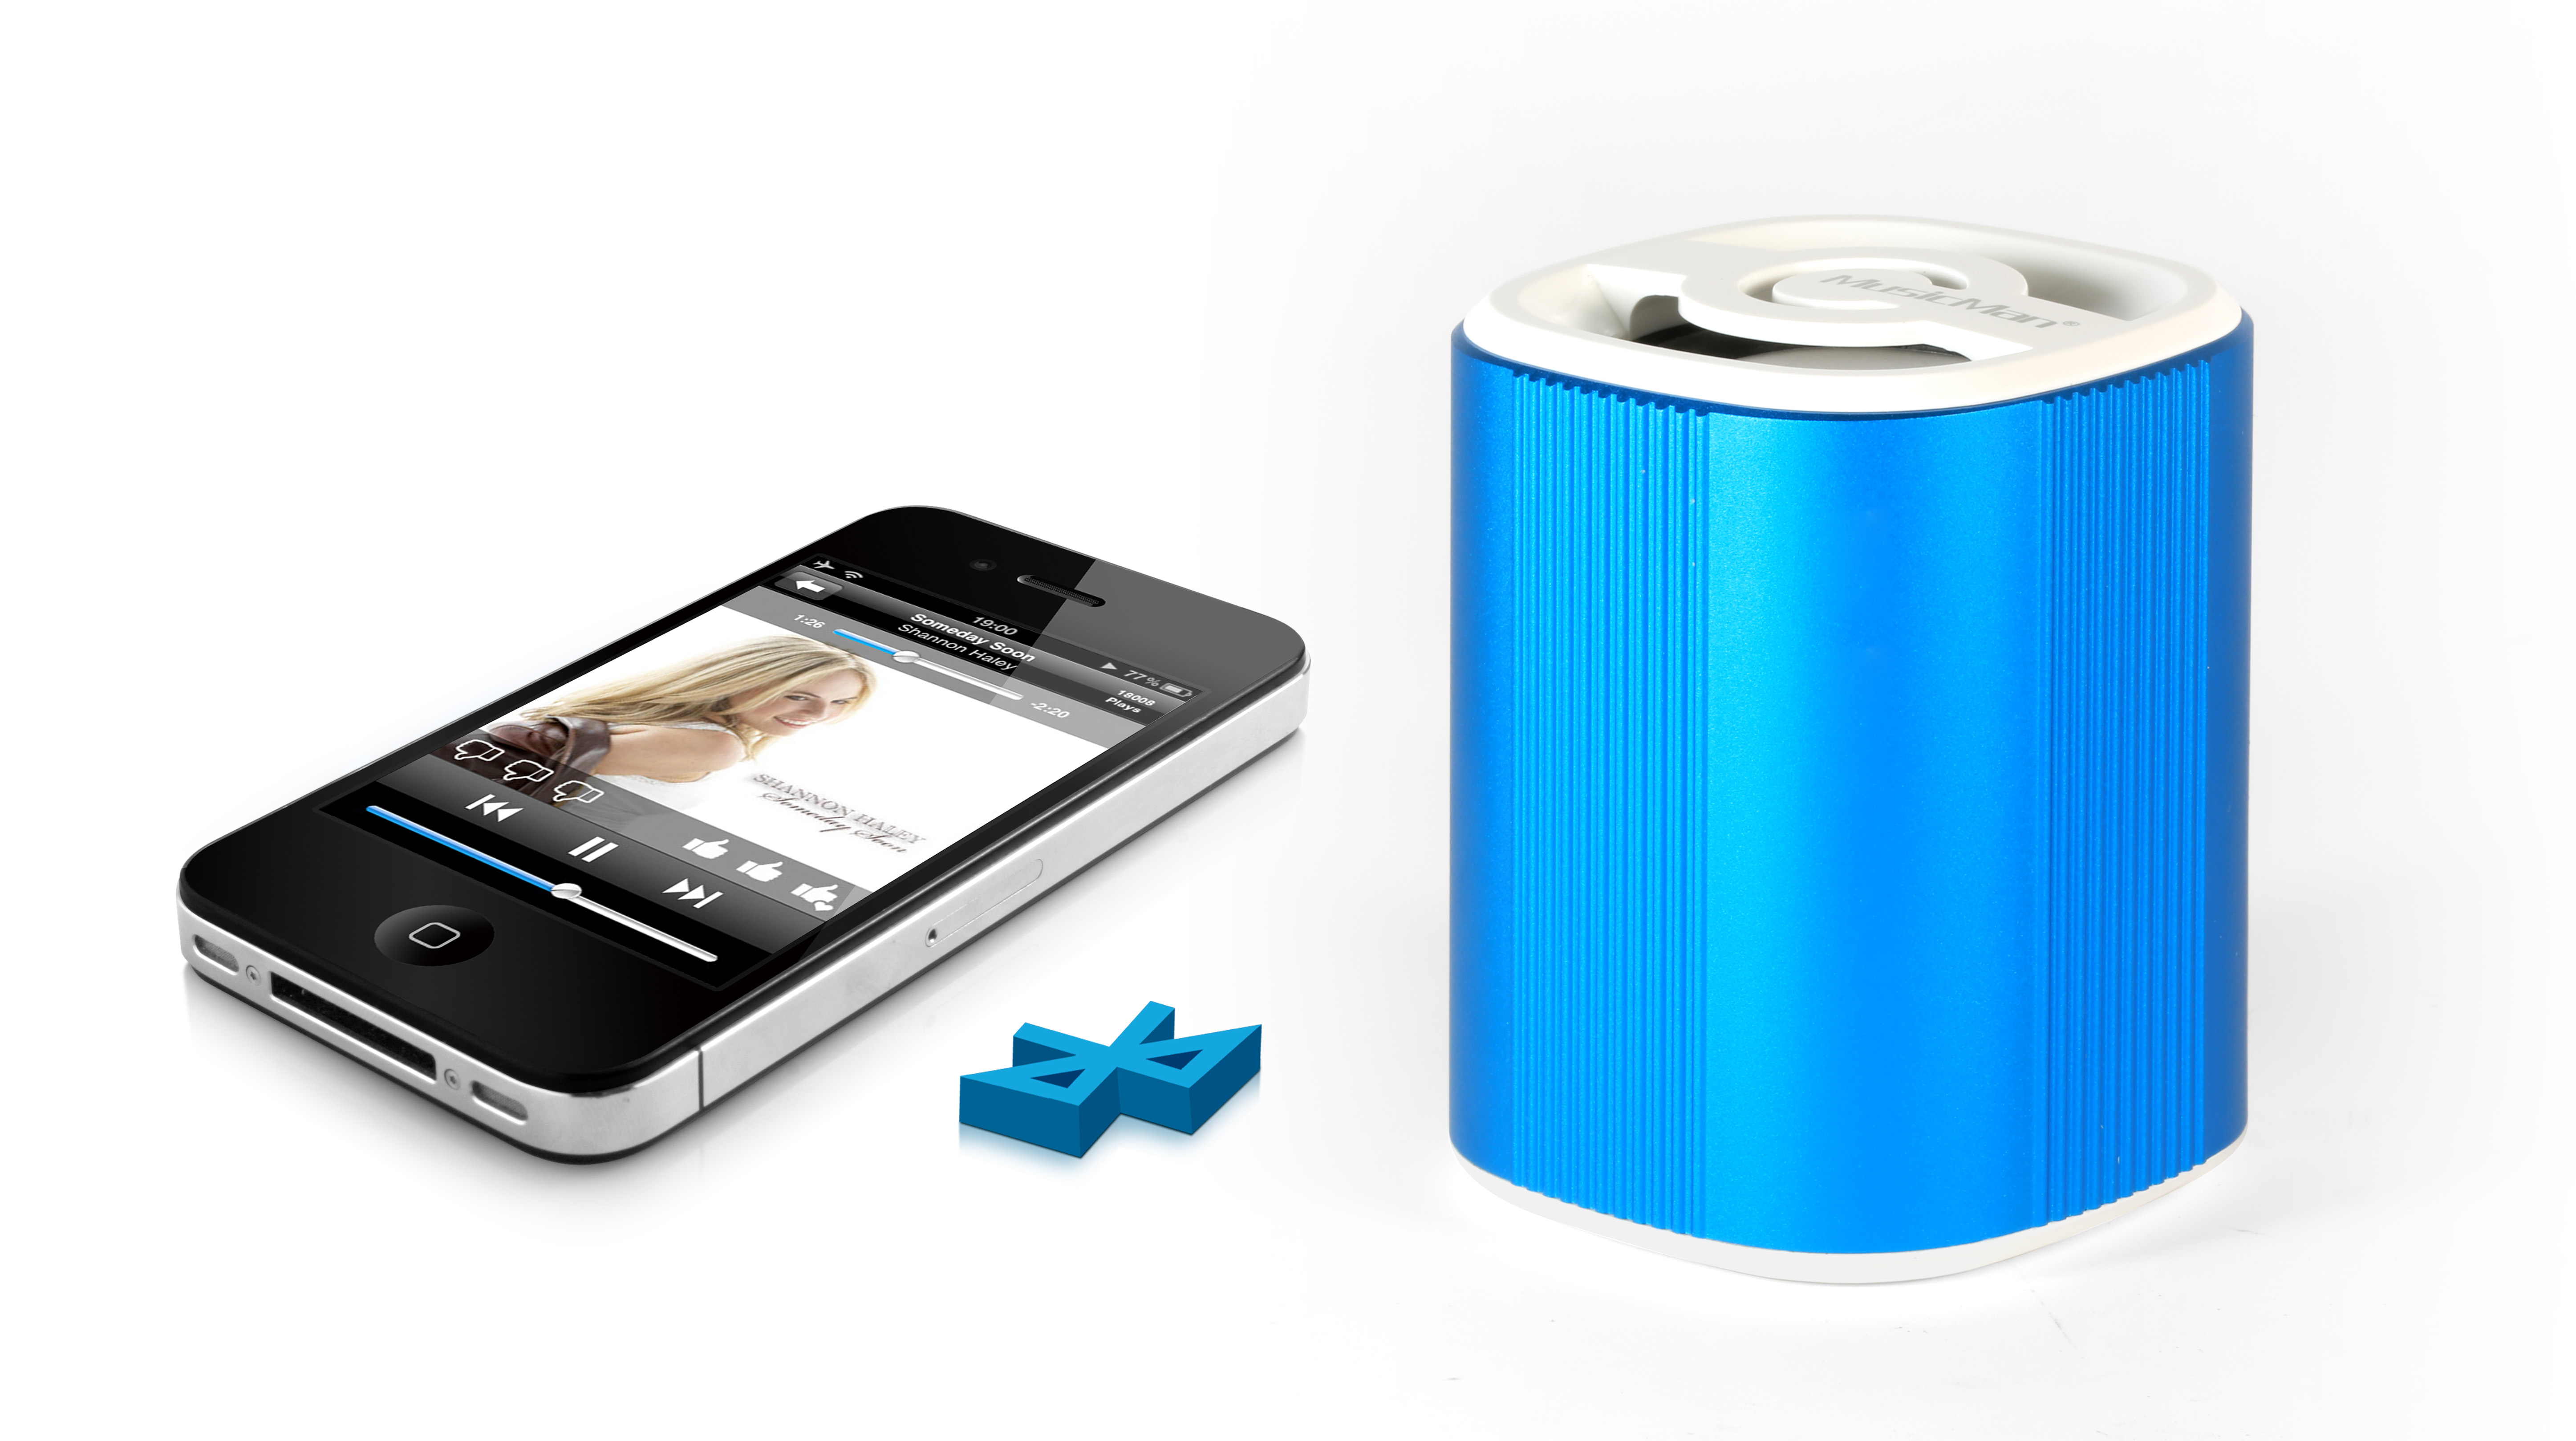 Přenosný Bluetooth reproduktor Grenade Technaxx Mini MusicMan, baterie 600 mAh, modrý (BT-X4)